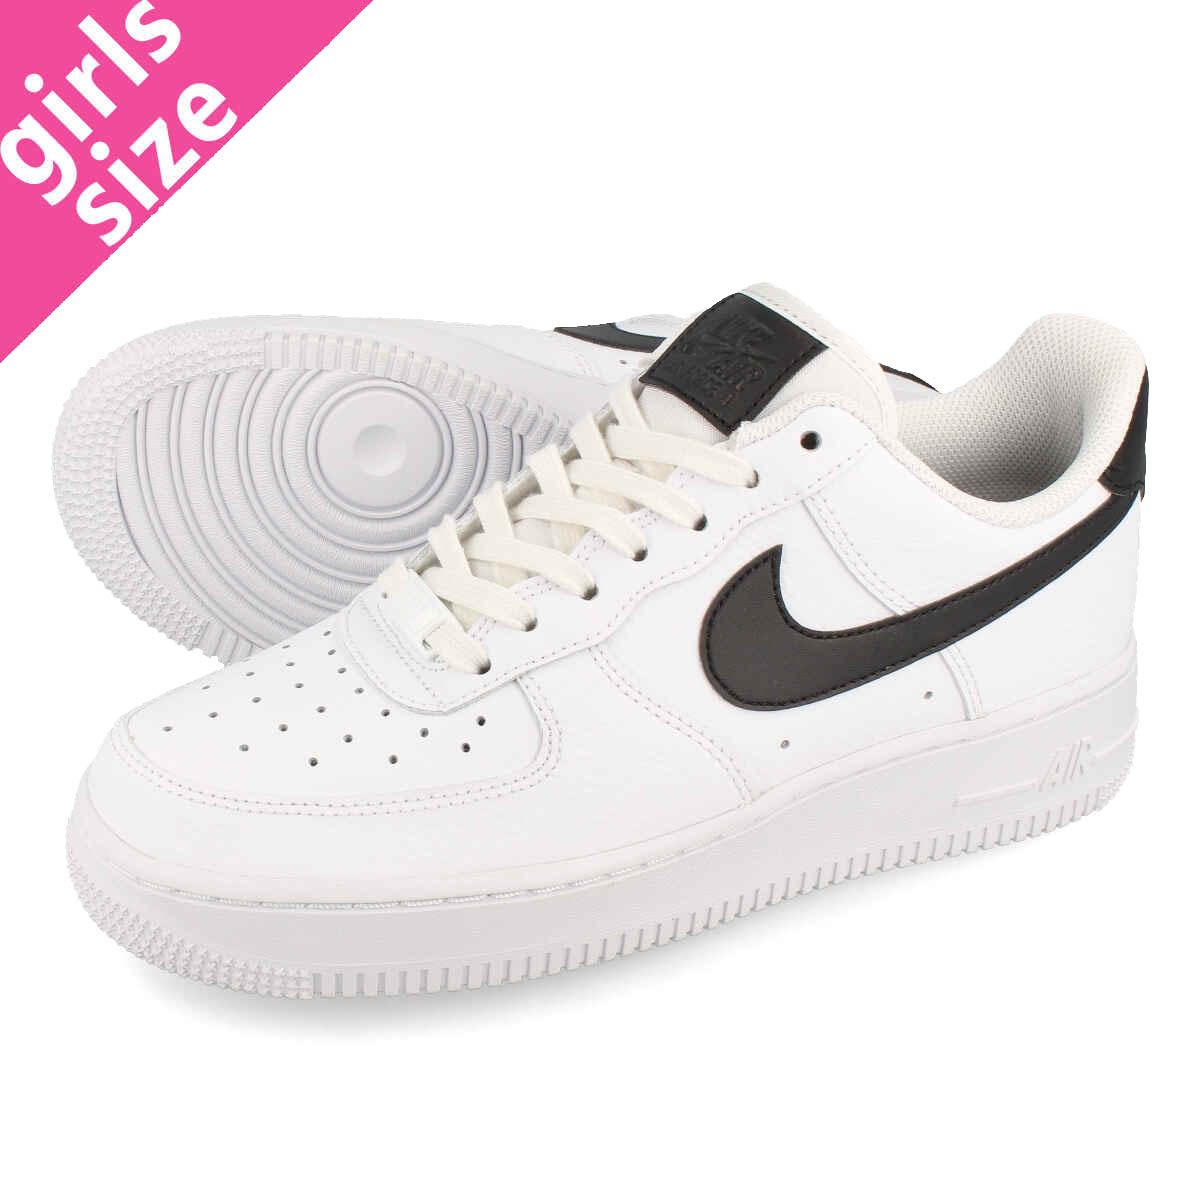 watch a66c1 b553b NIKE WMNS AIR FORCE 1 07 Nike women air force 1 07 WHITE WHITE BLACK  315,115-152